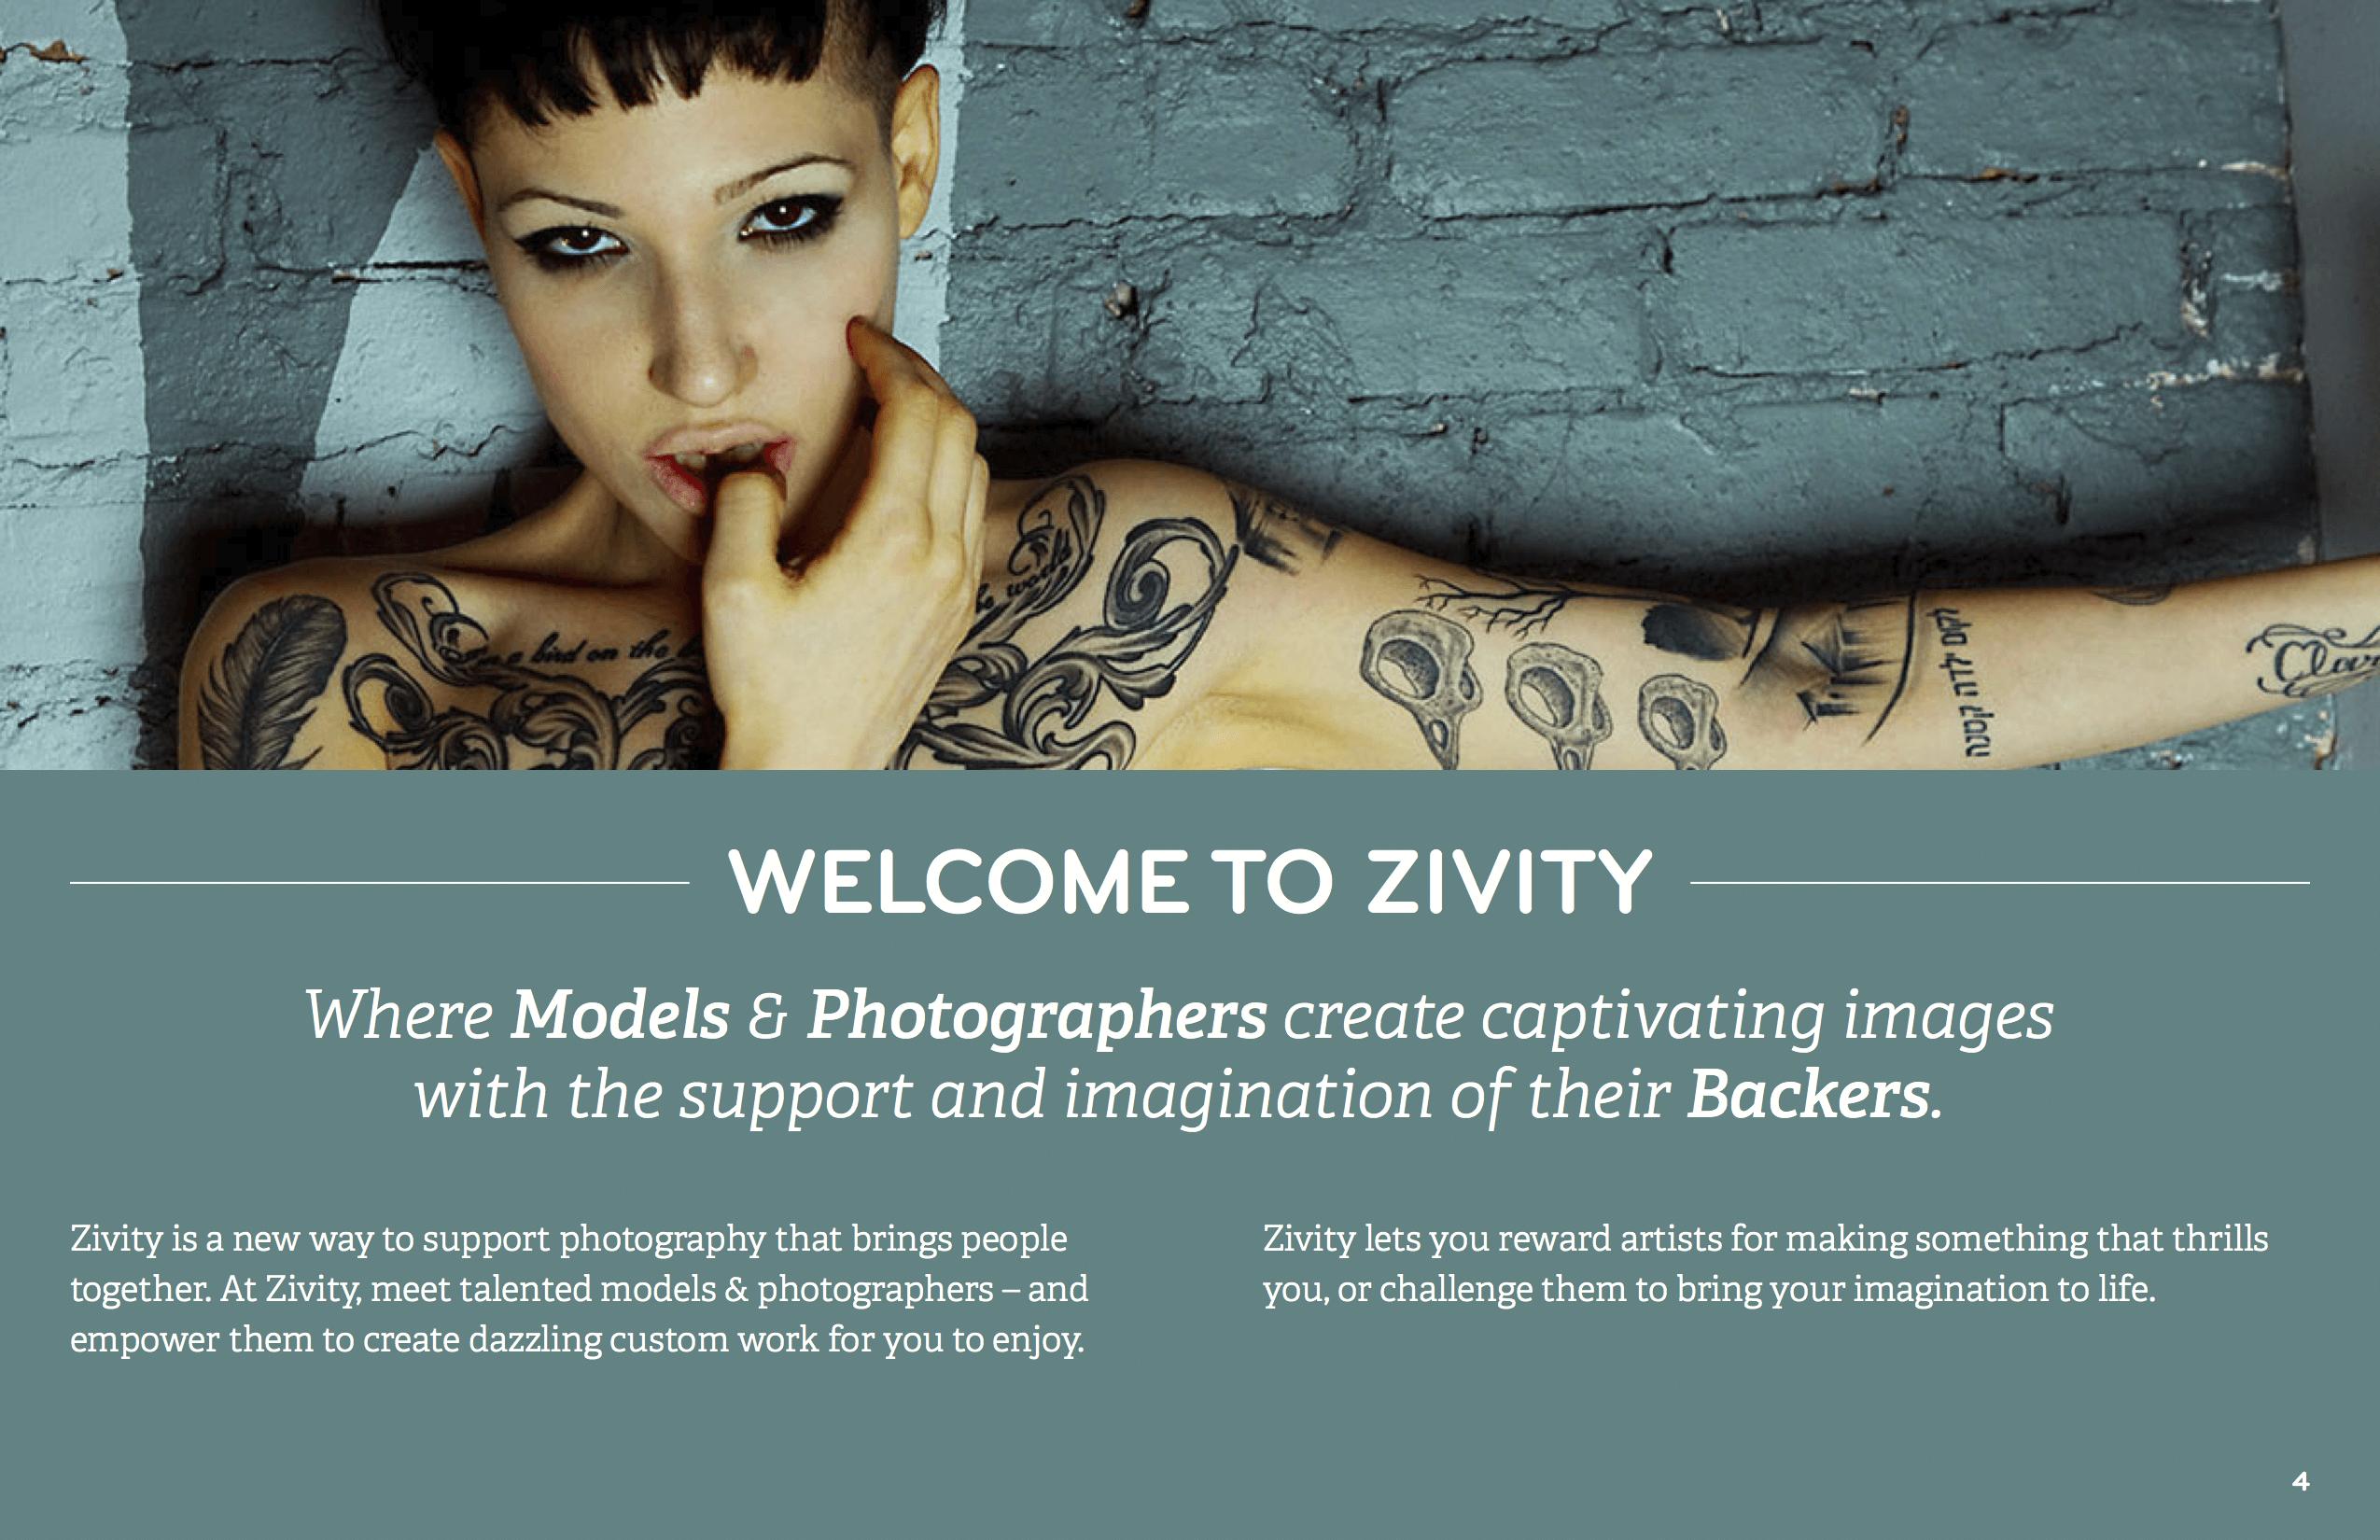 Zivity - image 4 - student project